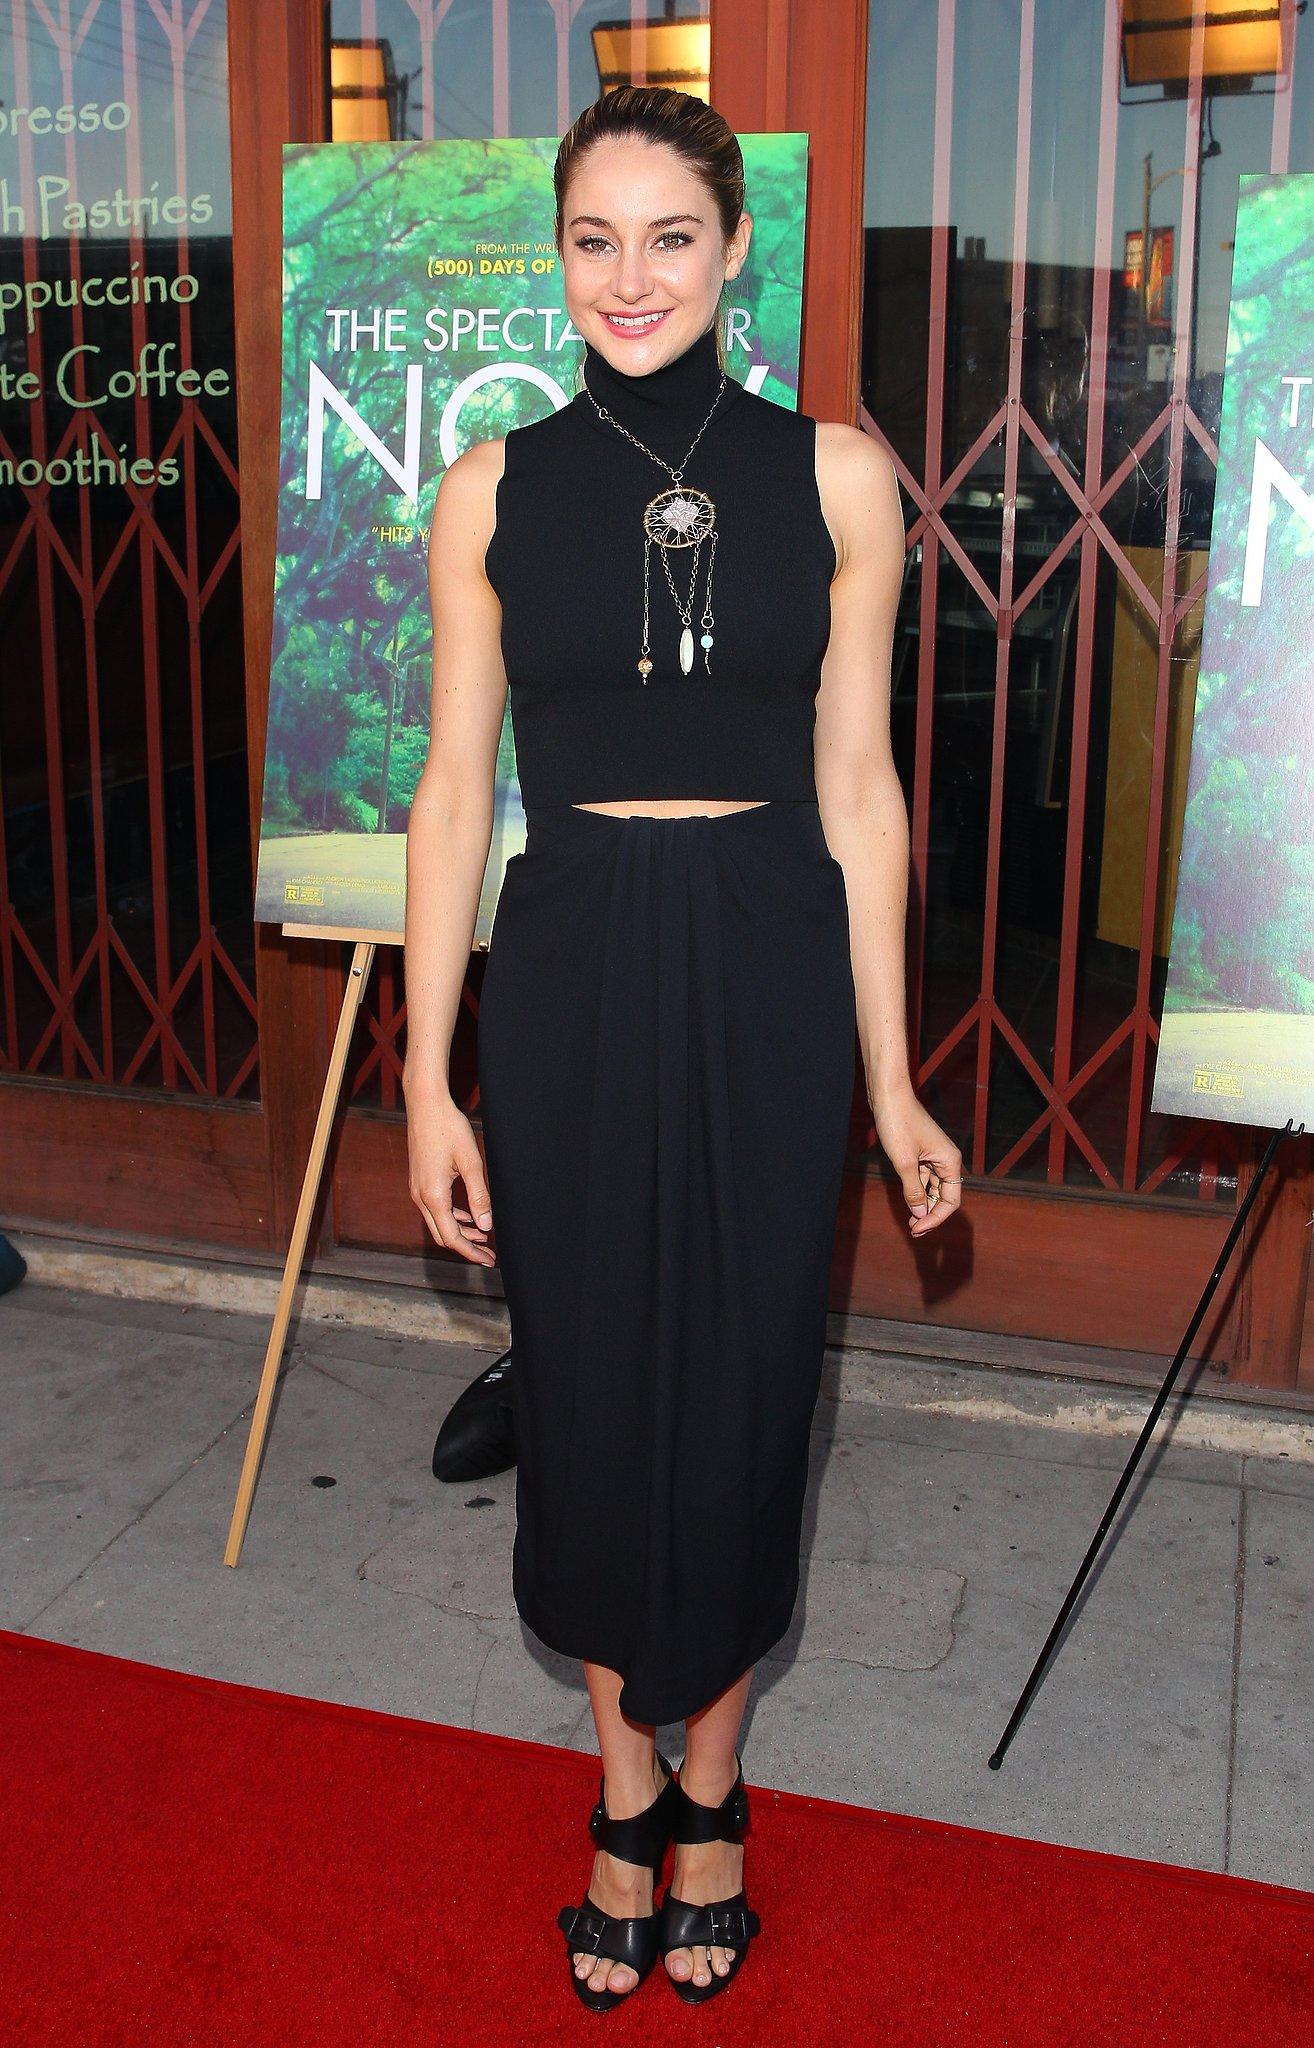 Shailene Woodley in Proenza Schouler at a Spectacular Now 2013 LA Screening